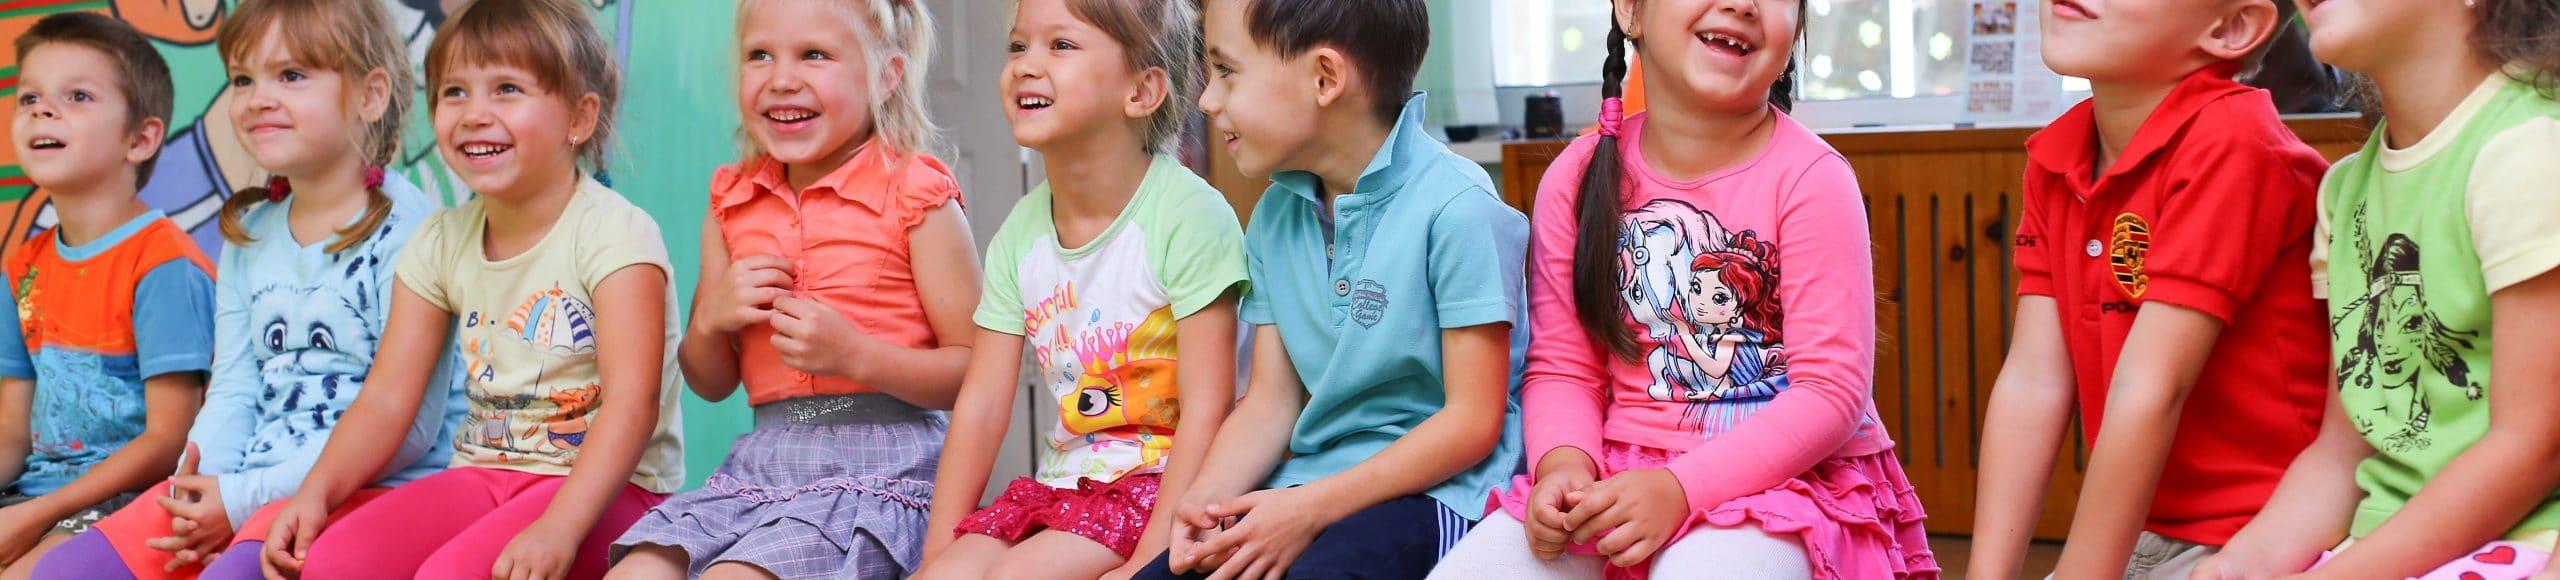 Kita Kind Kinder Frühkindliche Bildung Kindertagesstätte Kindergarten